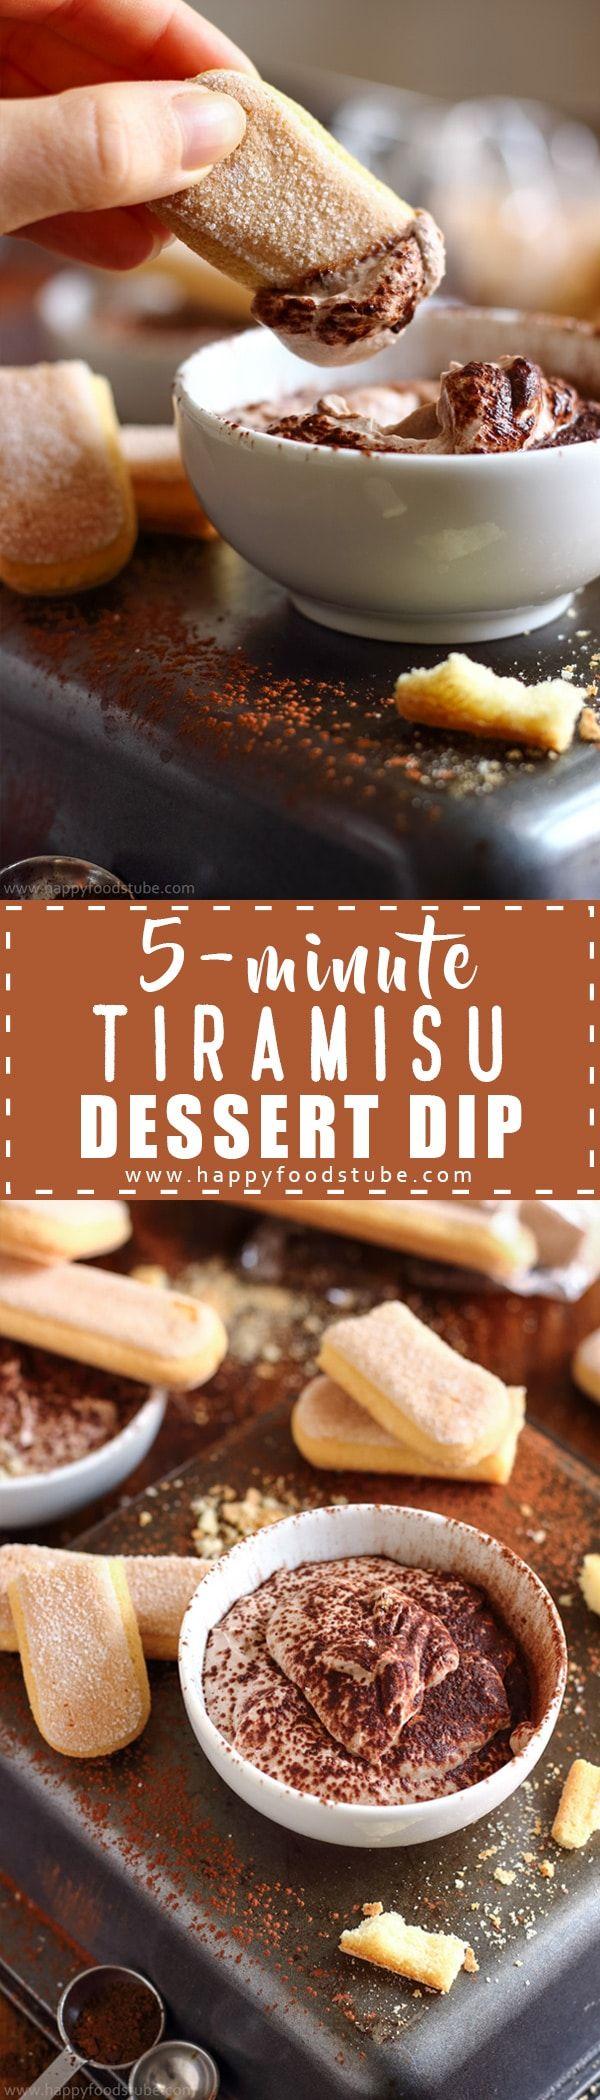 Easy 5-minute tiramisu dessert dip recipe. This rich & creamy dip made with mascarpone, cream, cocoa & coffee tastes like real tiramisu via @happyfoodstube